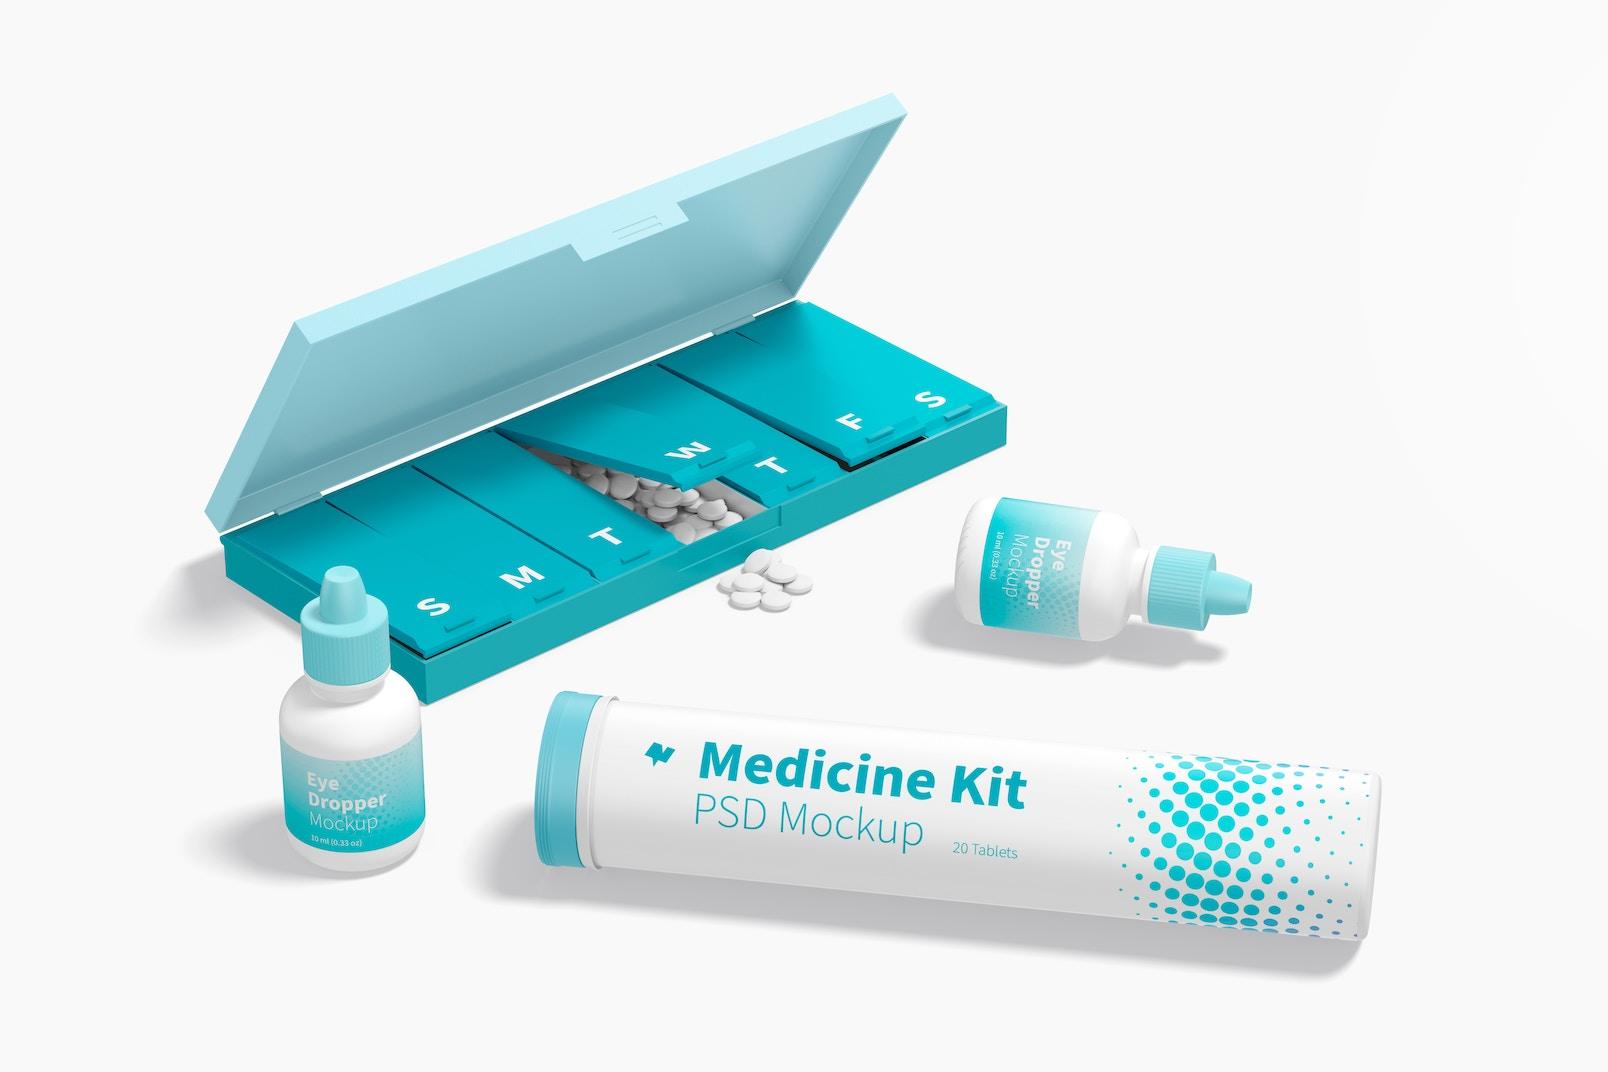 Medicine Kit Mockup, Left View